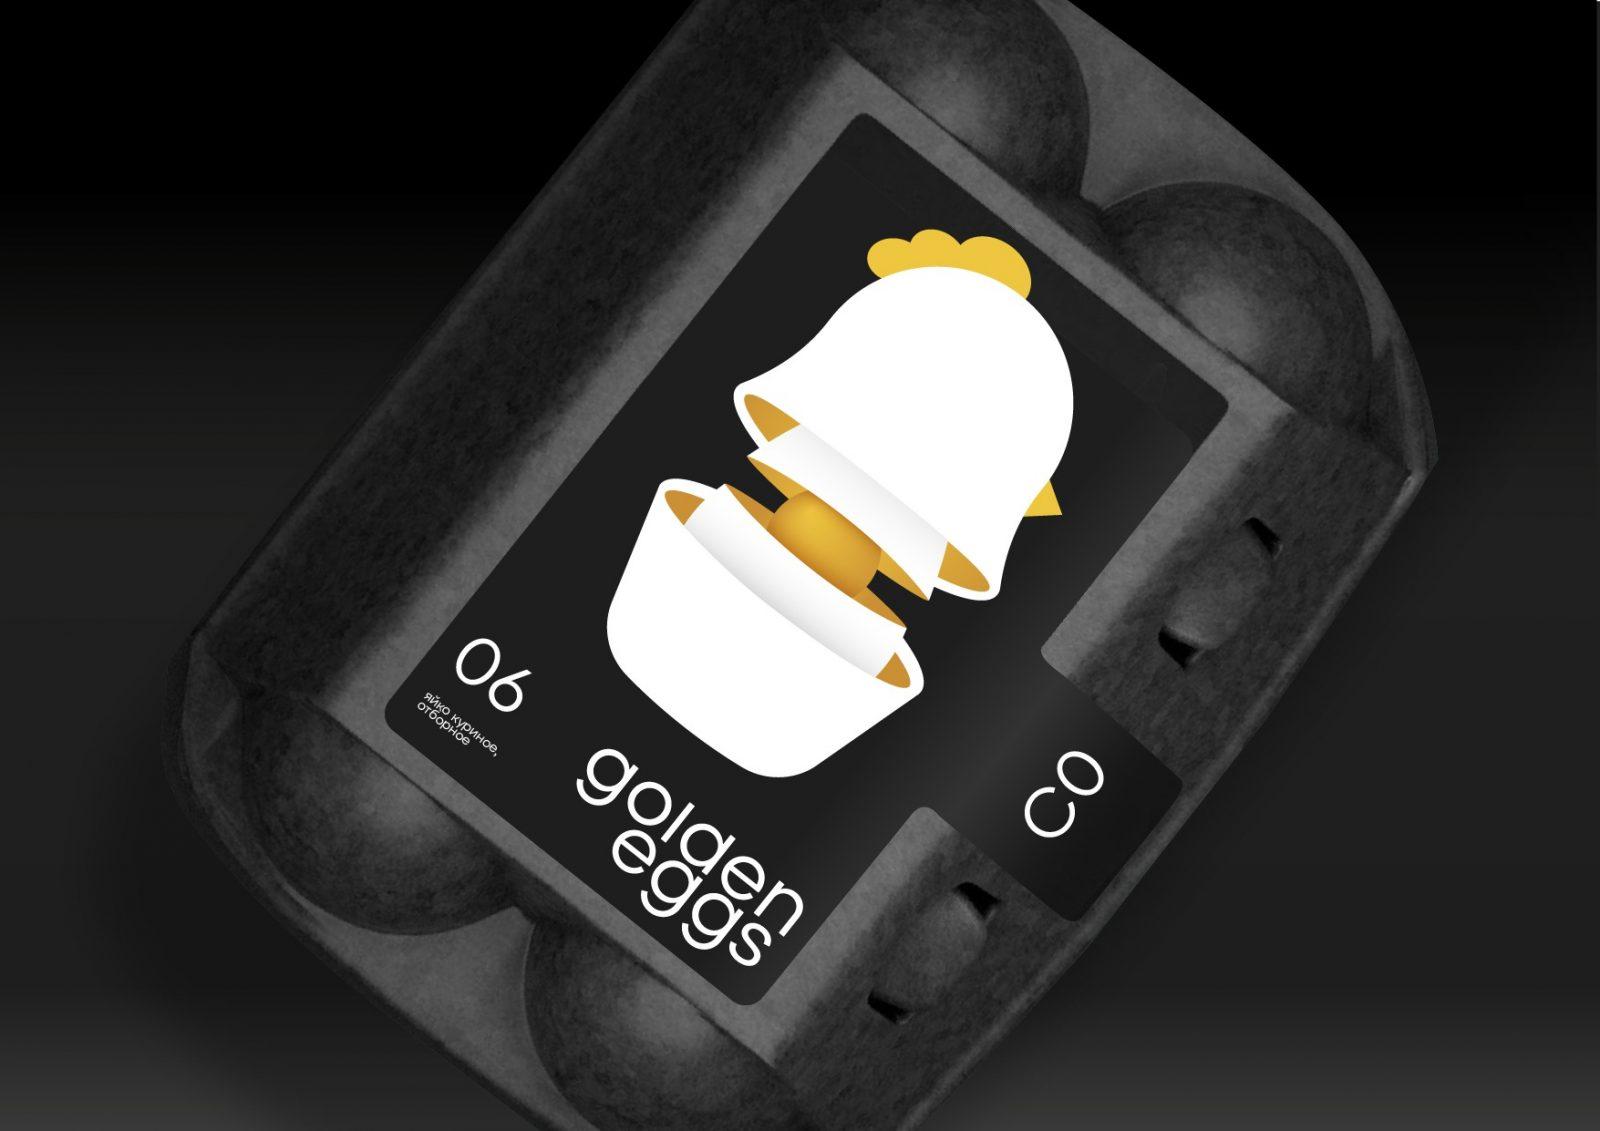 Student Packaging Design Concept for Golden Eggs